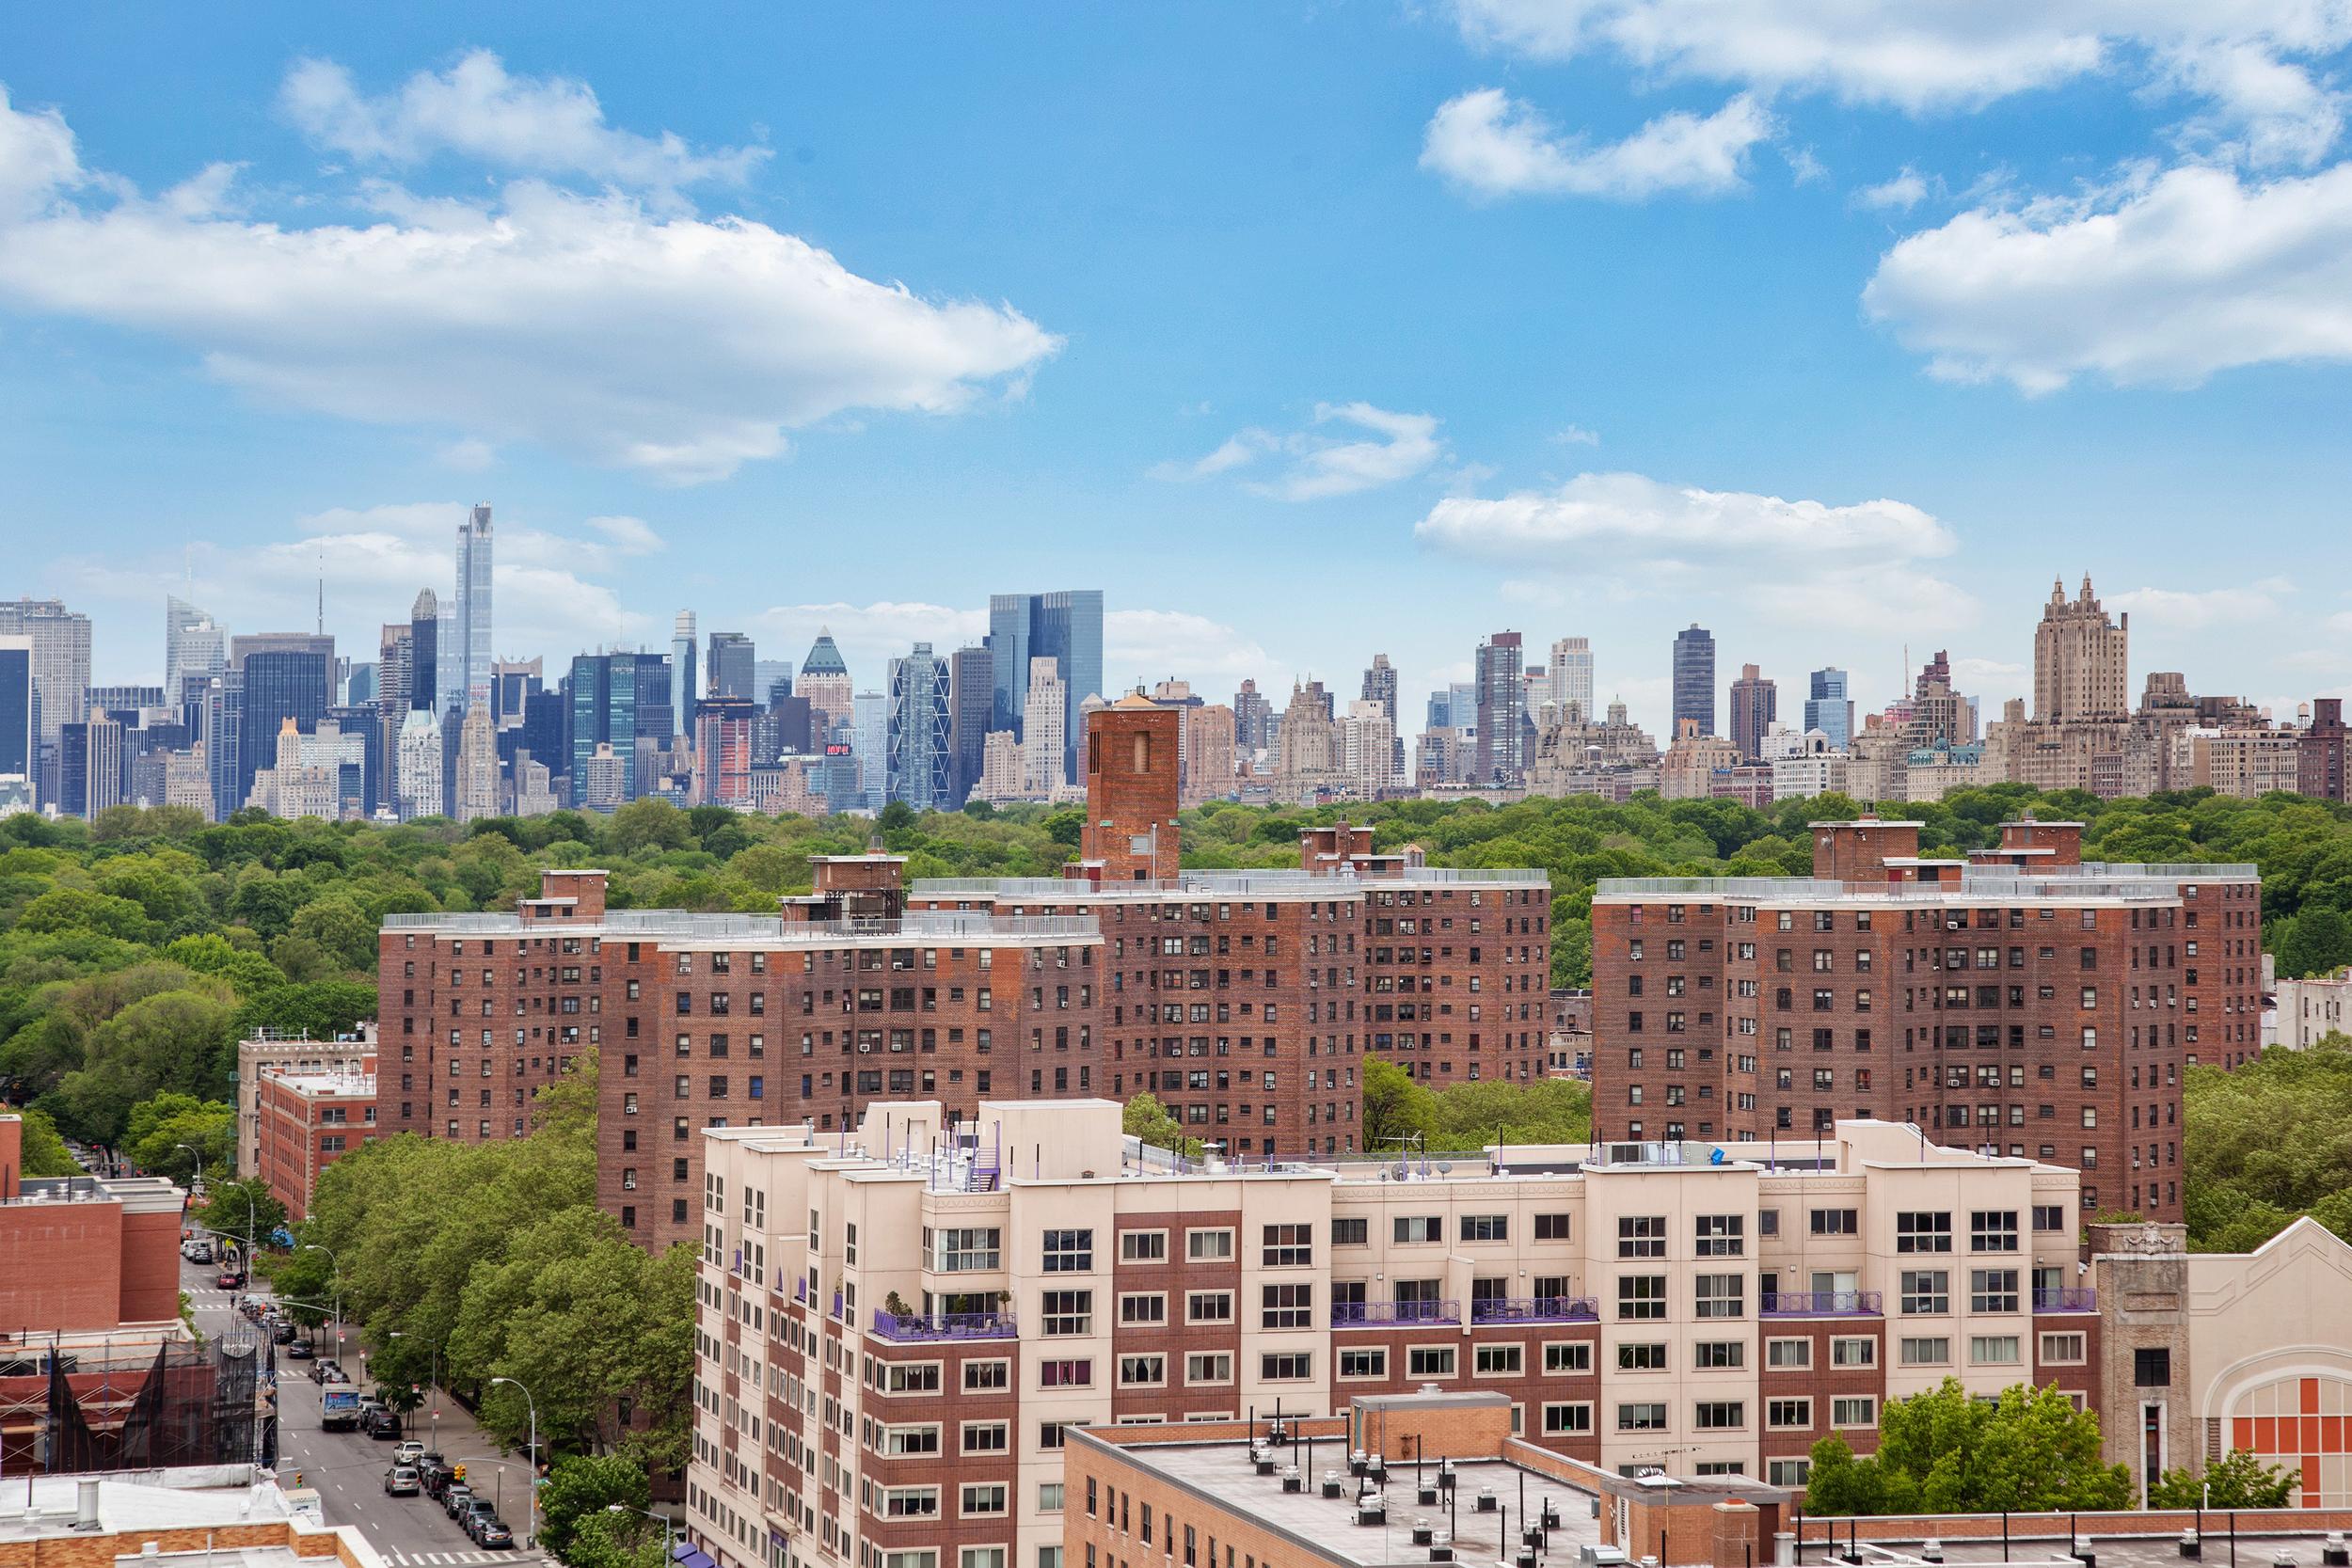 1485 Fifth Avenue #14H - $2,400,000